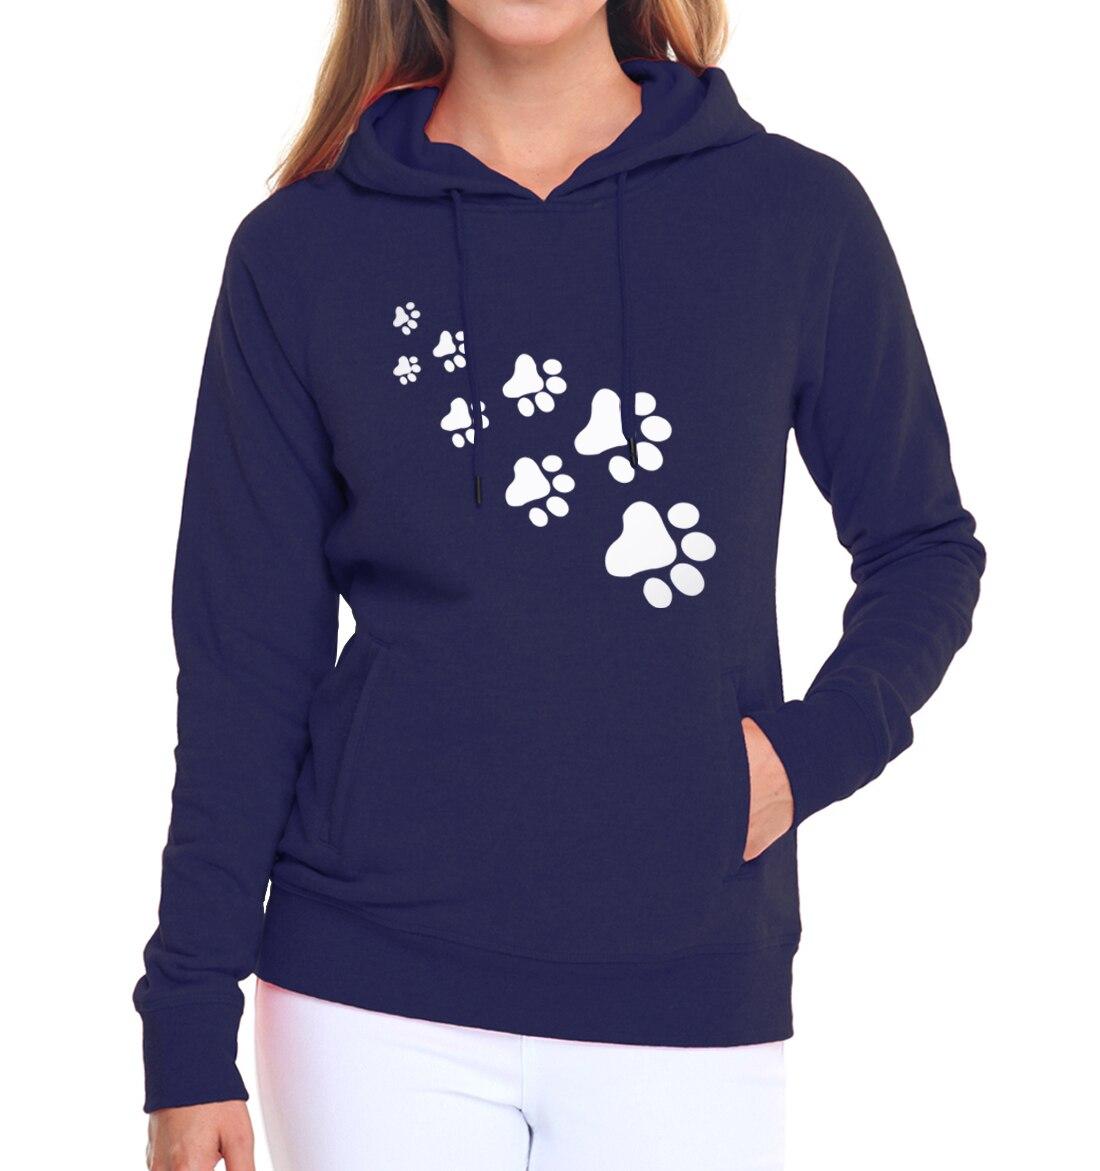 Casual fleece autumn winter sweatshirt pullovers 17 kawaii cat paws print hoodies for Women black pink brand tracksuits femme 4